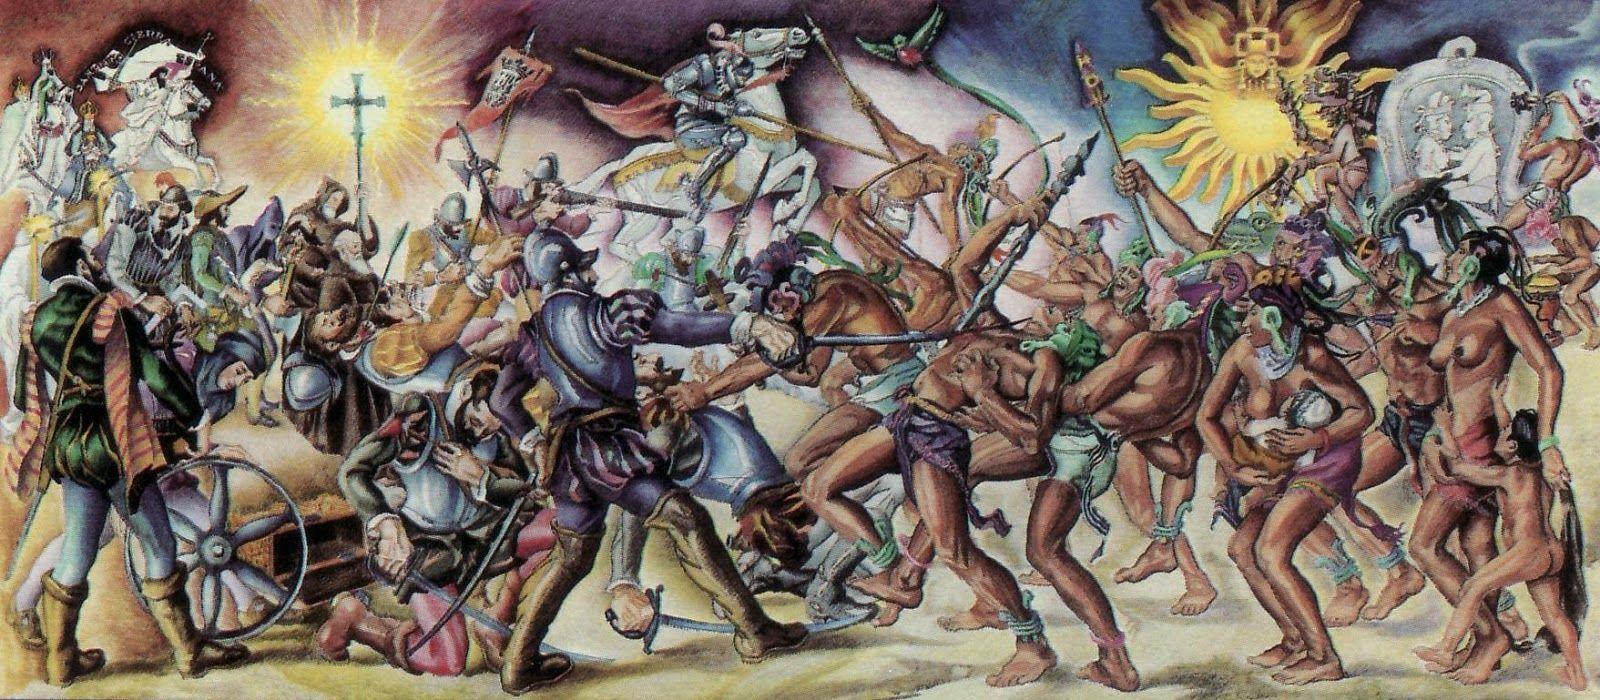 Pedro Alvarado and the Conquistadores in combat